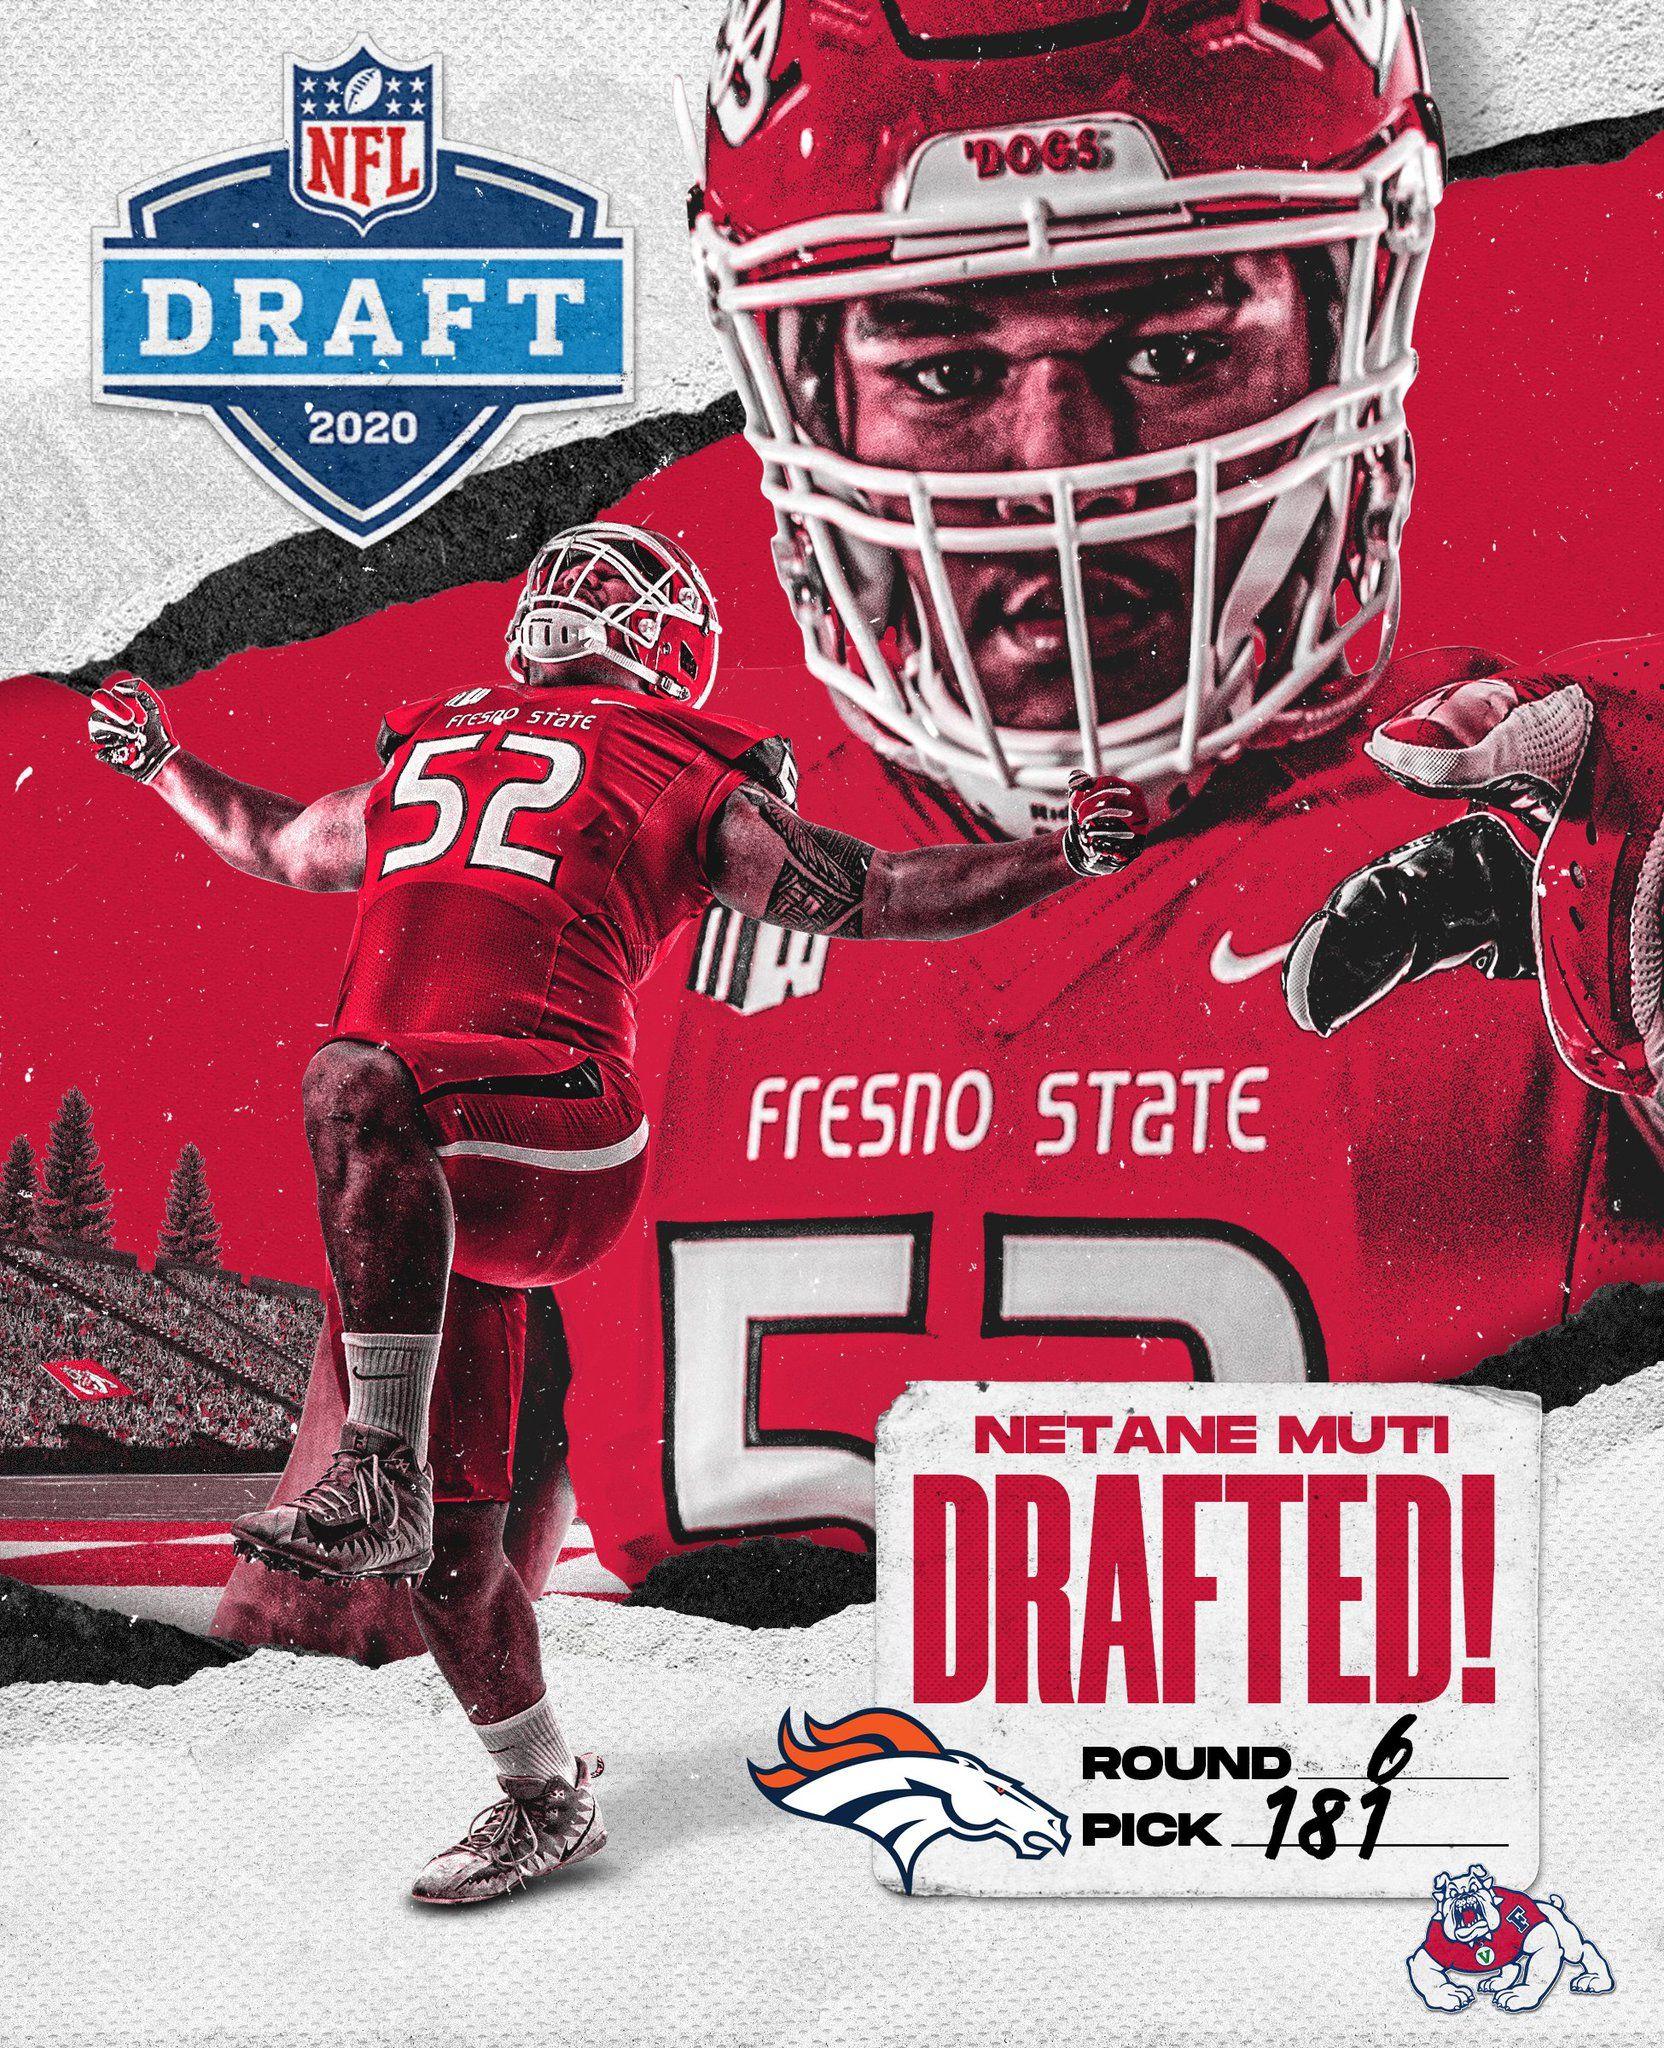 Fresno State Football On Twitter In 2020 Fresno State Football Football Fresno State